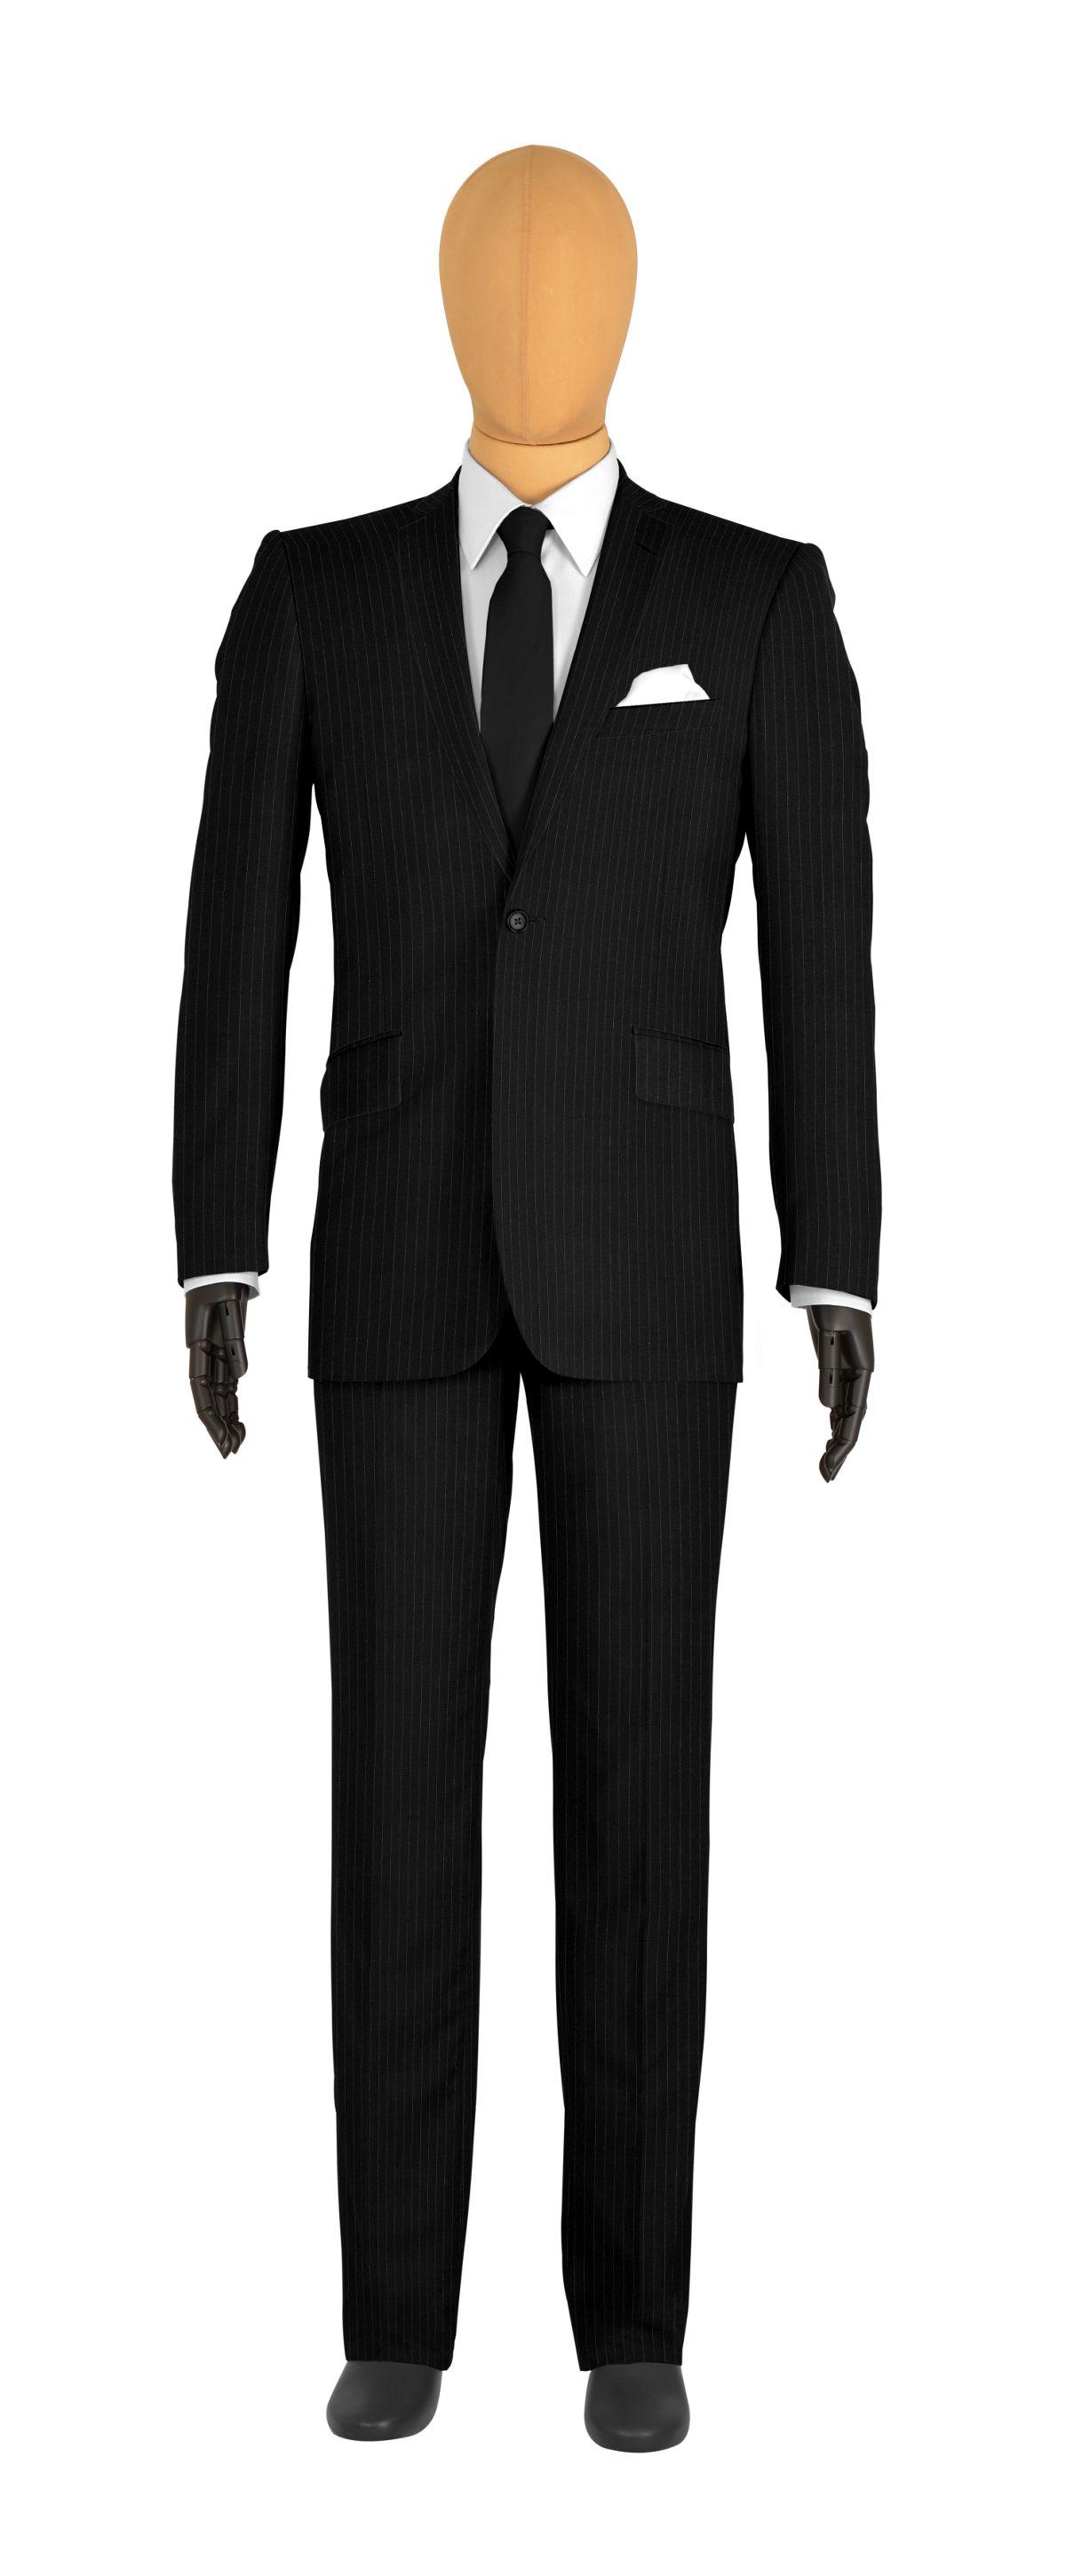 Costume 1 bouton noir rayé